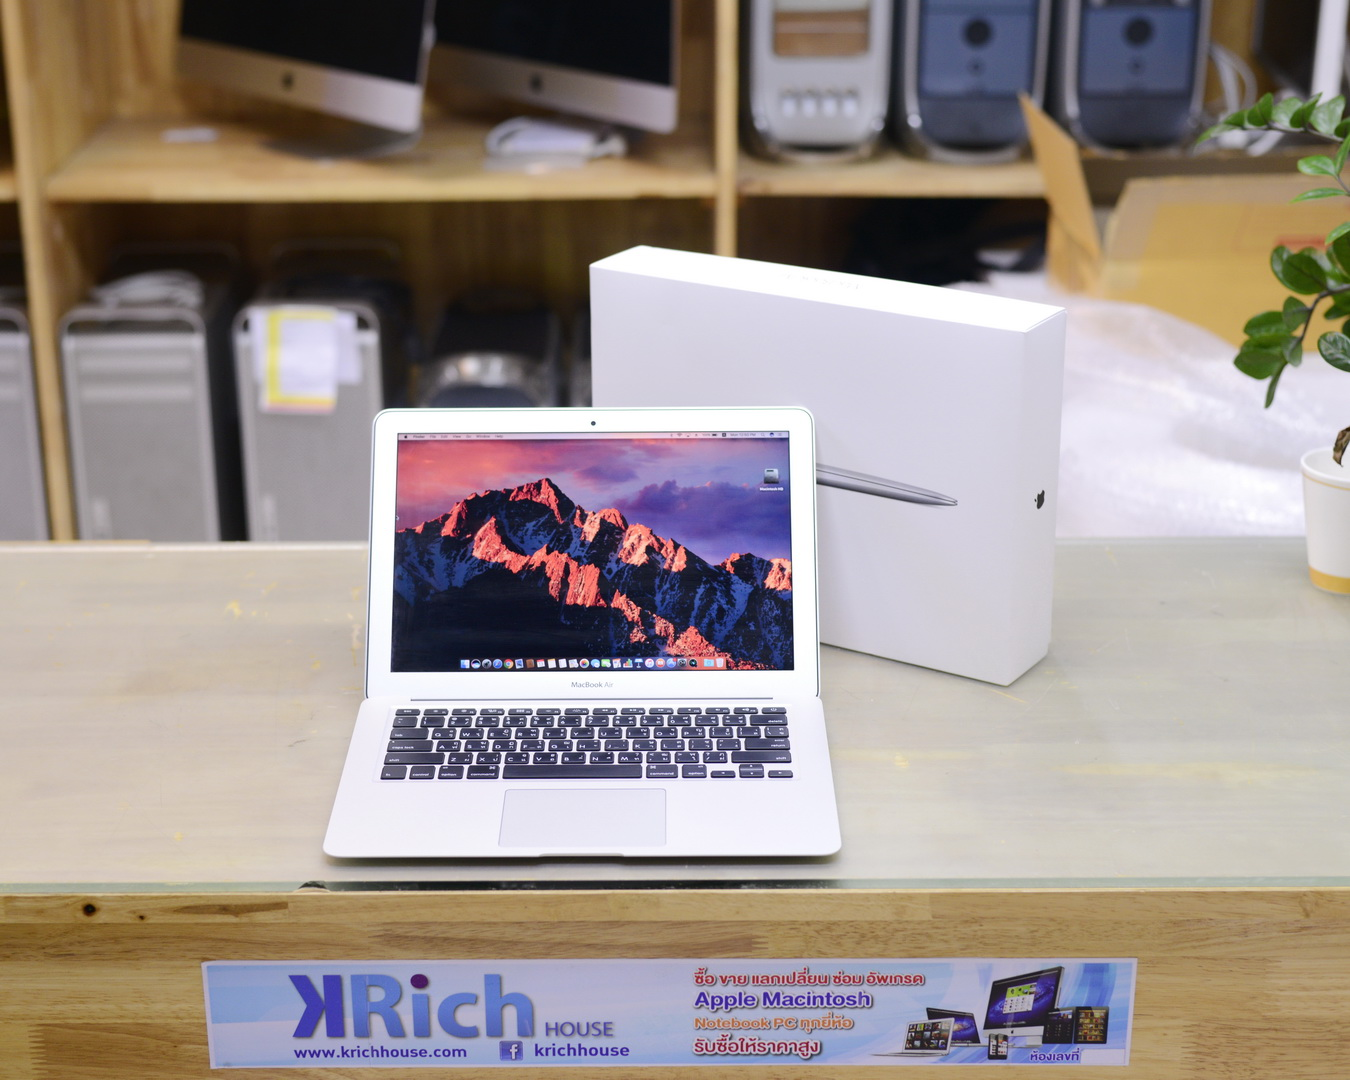 MacBook Air (13-inch, Early 2015) Core i5 1.6GHz RAM 4GB SSD 128GB - FullBox